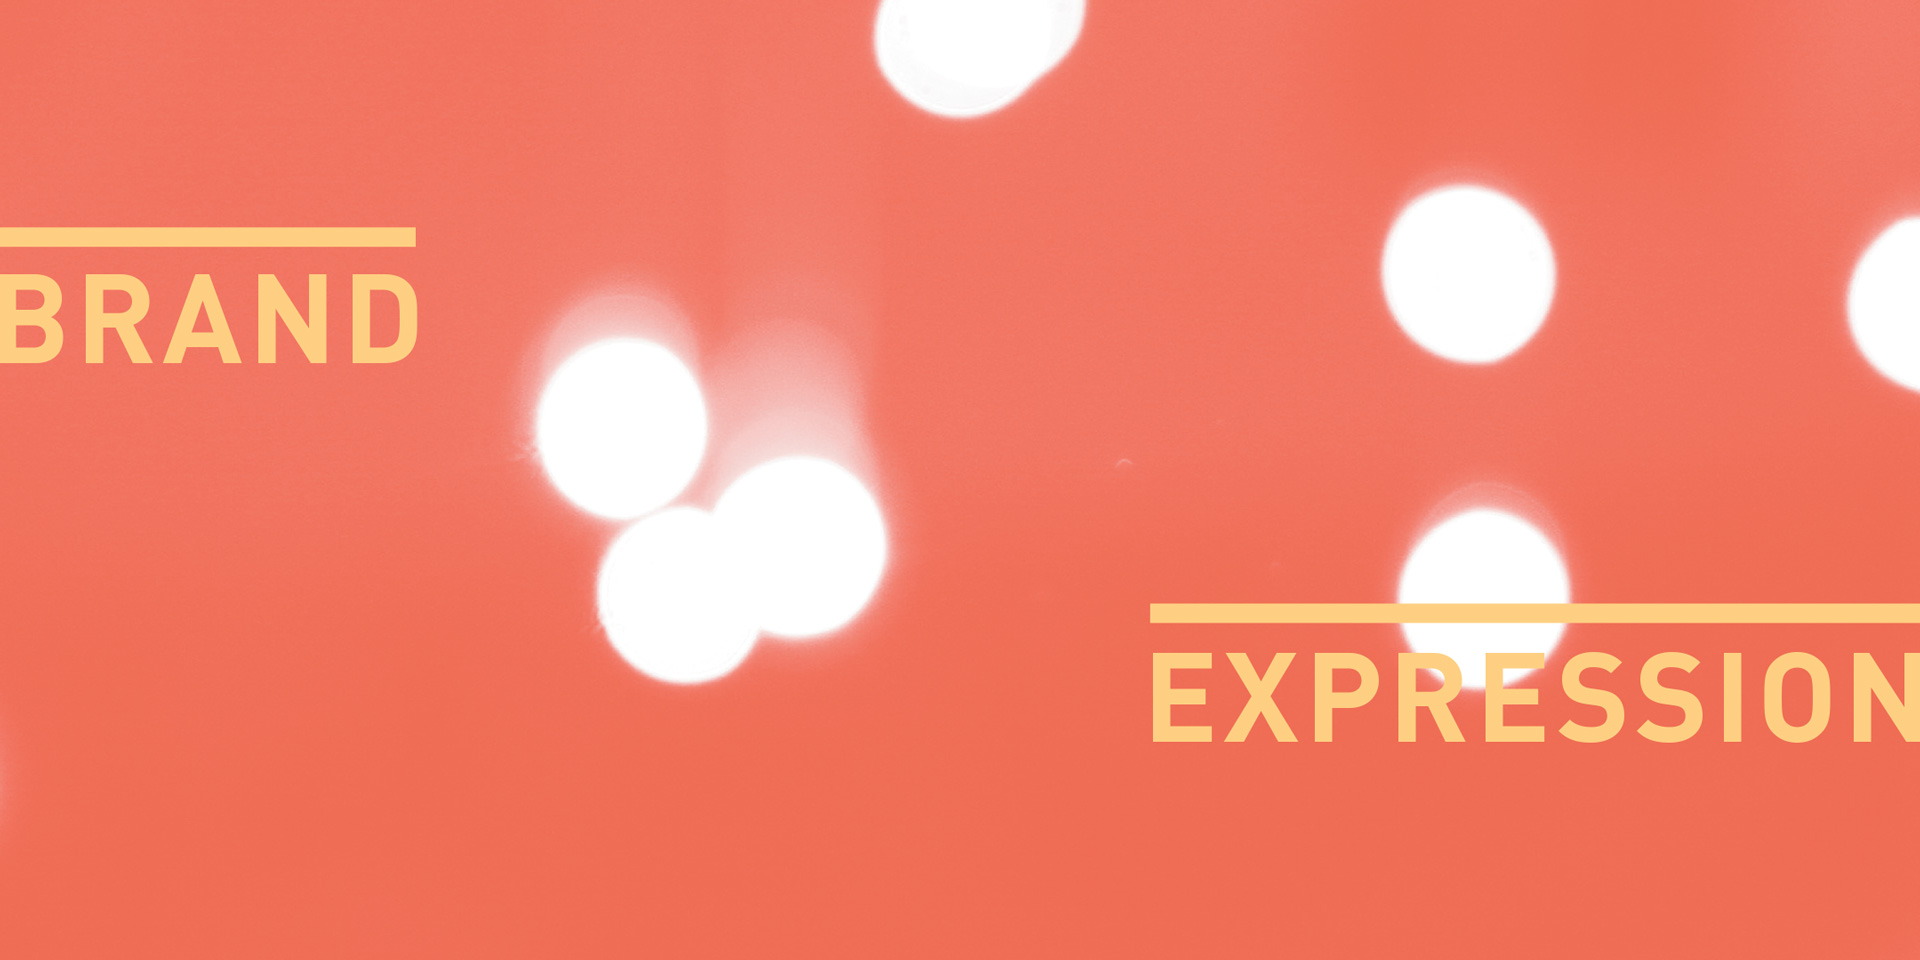 SSWeb-Bunkr-Brand Expression